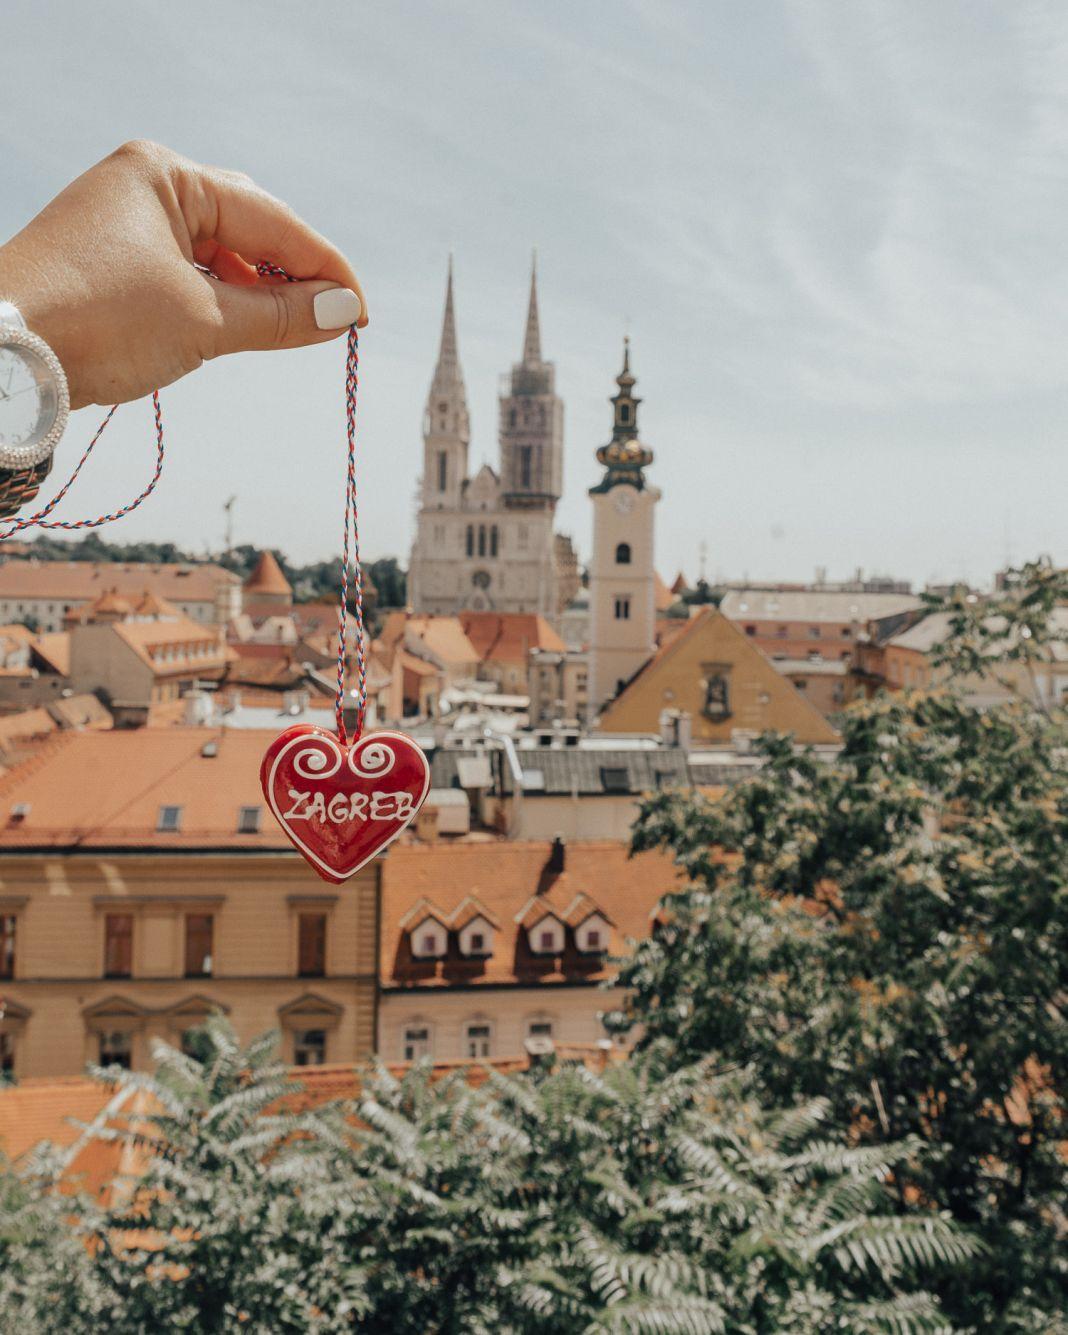 16 Best Things To Do In Zagreb Croatia Zagreb Croatia Croatia Travel Guide